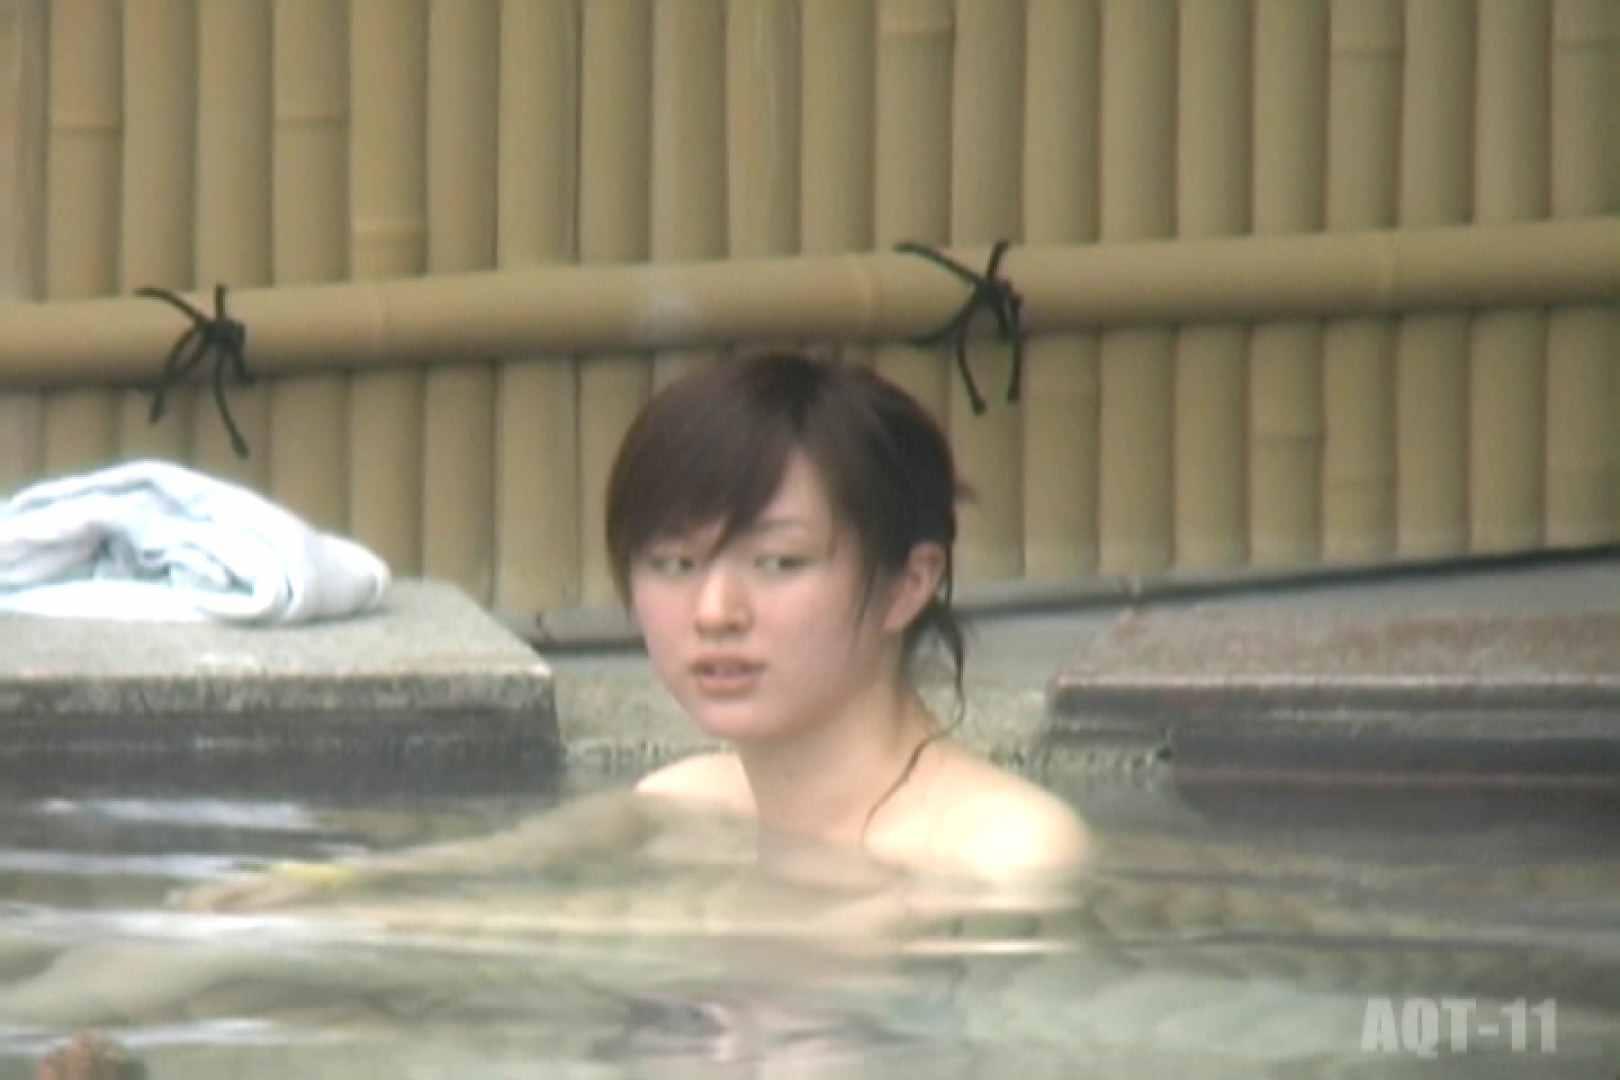 Aquaな露天風呂Vol.798 OL女体  107連発 102